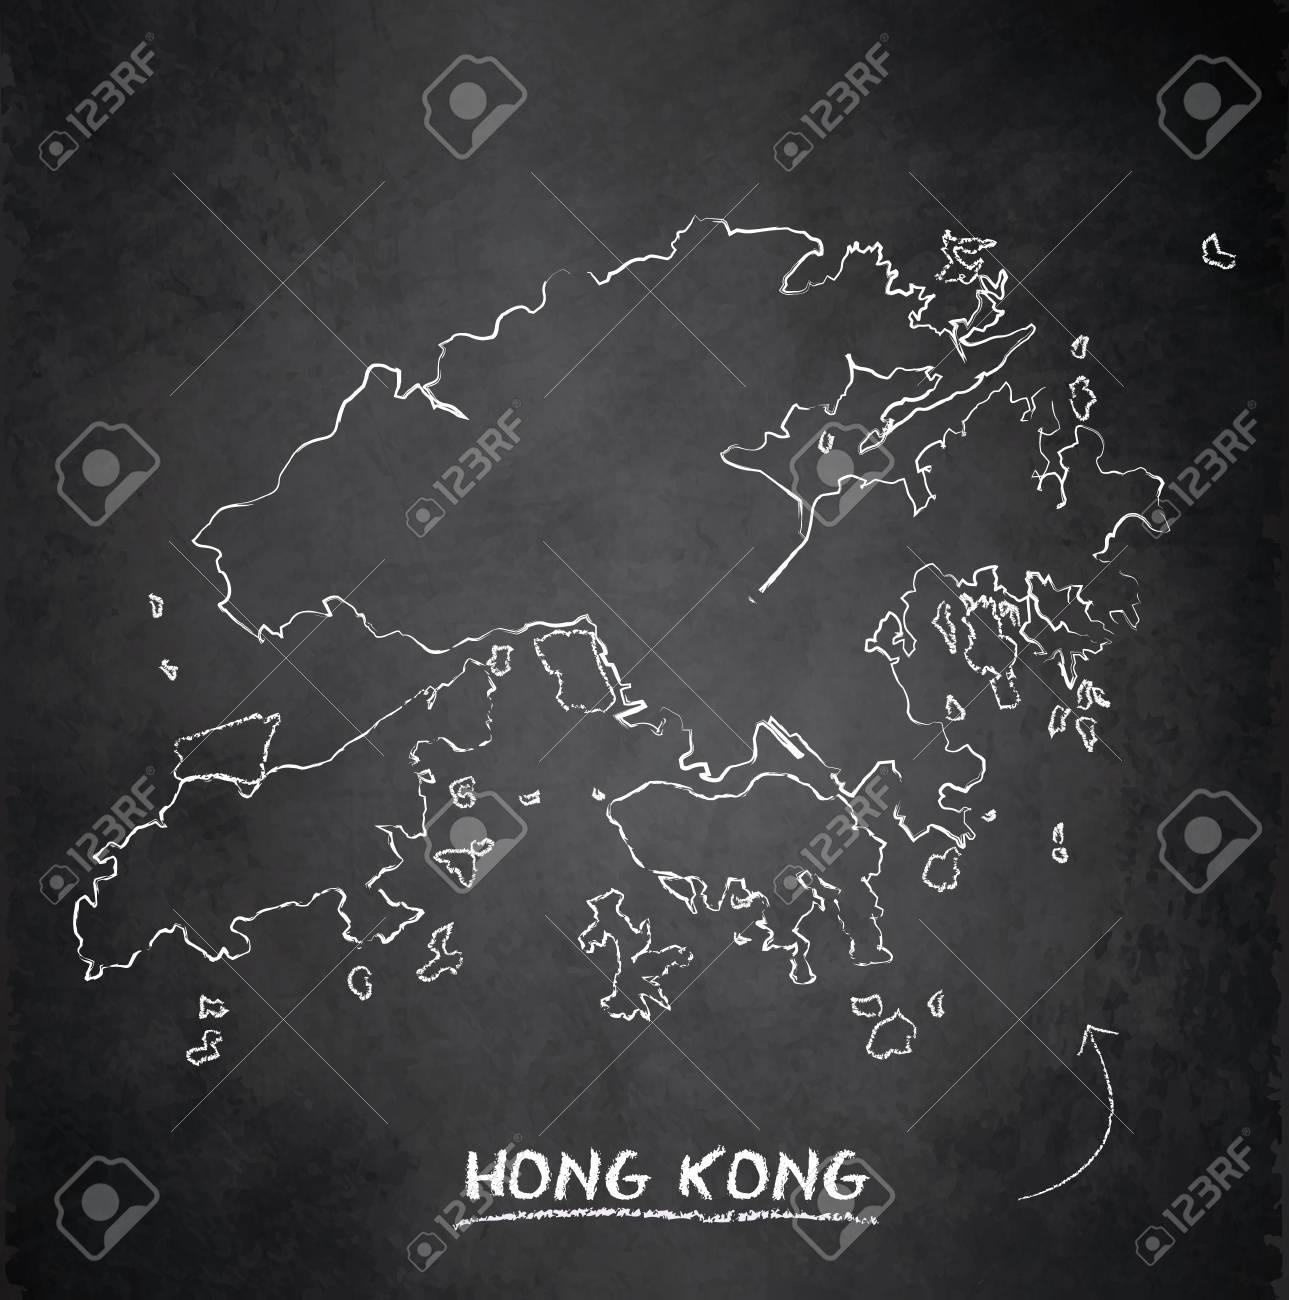 Hong Kong map blackboard chalkboard vector - 98031556